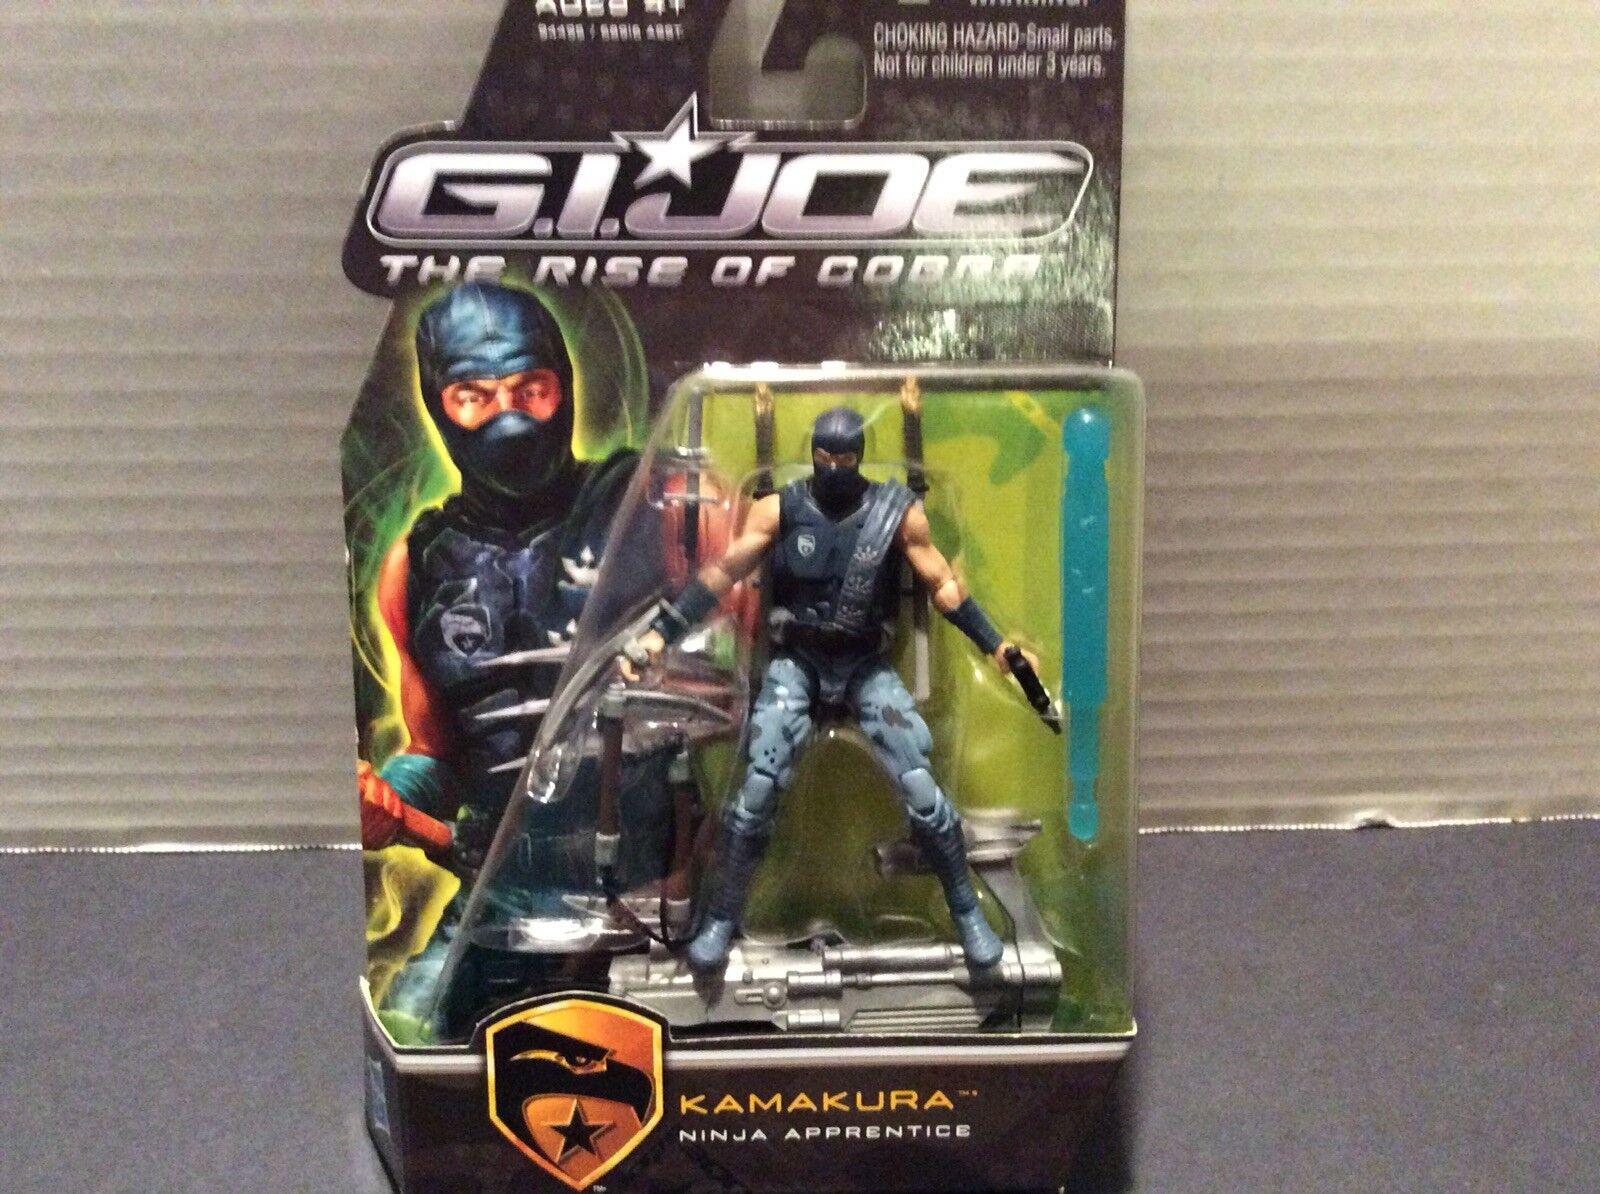 GI Joe Rise of Cobra Ninja Apprentice Kamakura nztgfb9680-Military